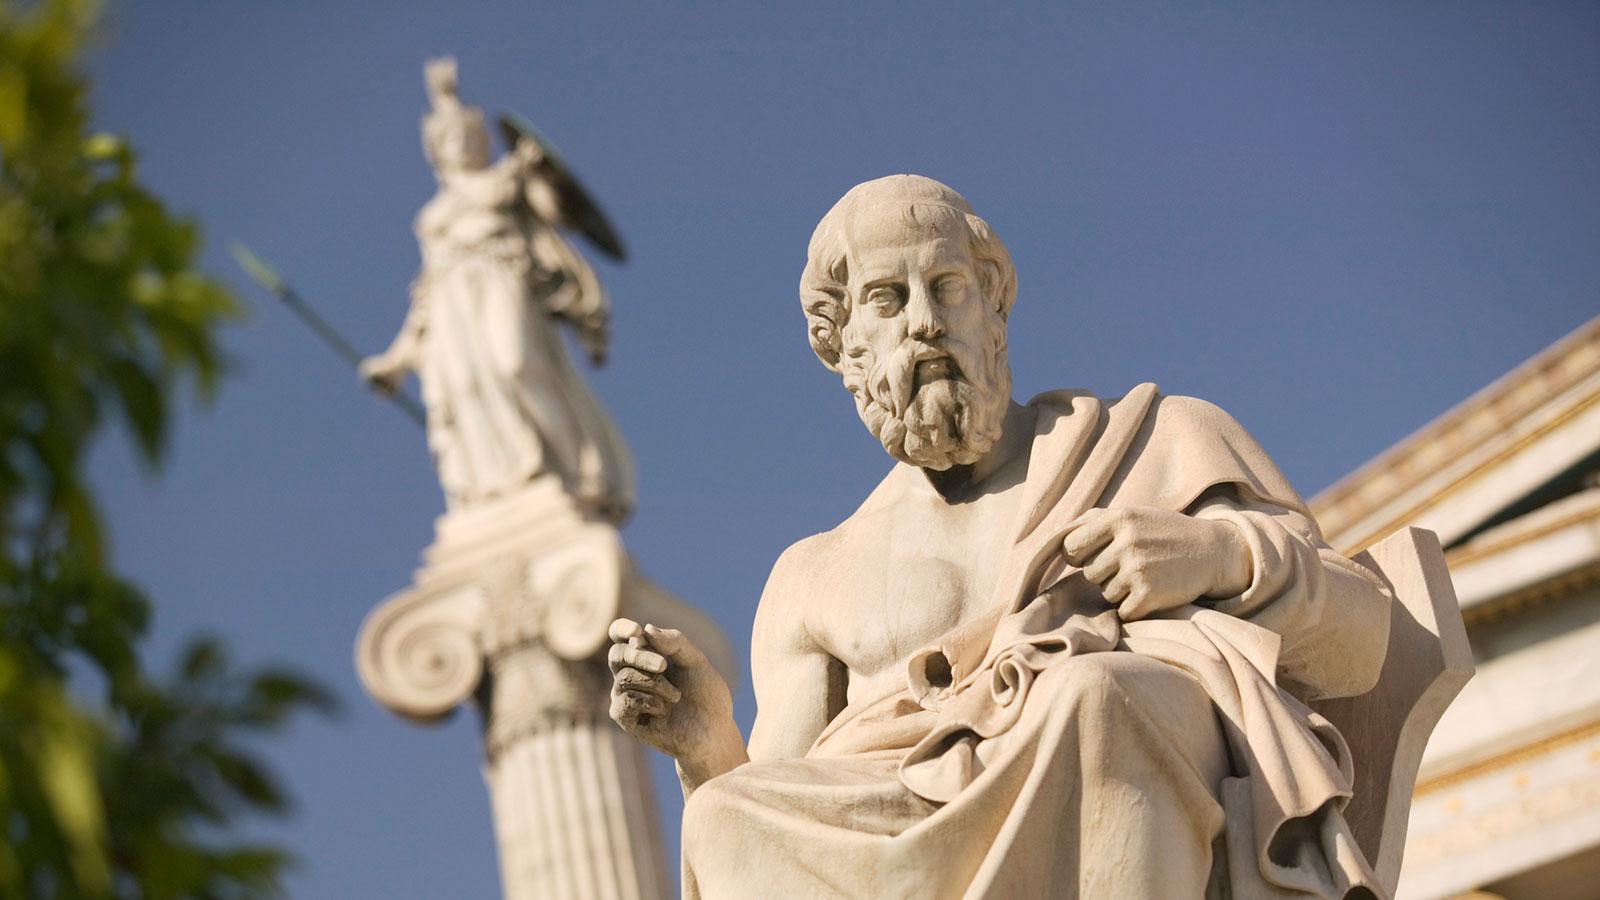 Statue of Plato. Socrates Athens